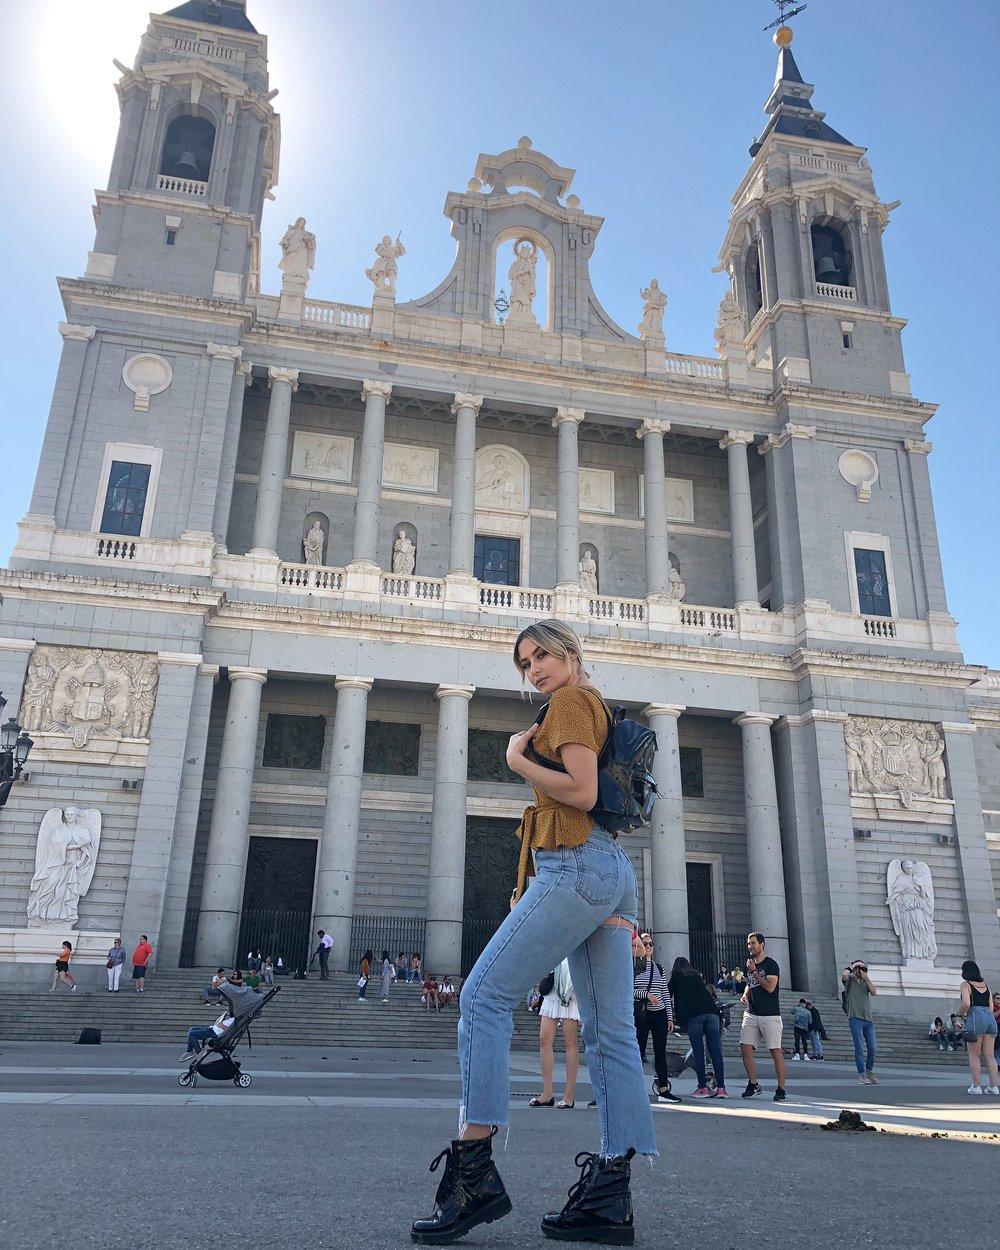 Catedral de la Almunda. Madrid, Spain.